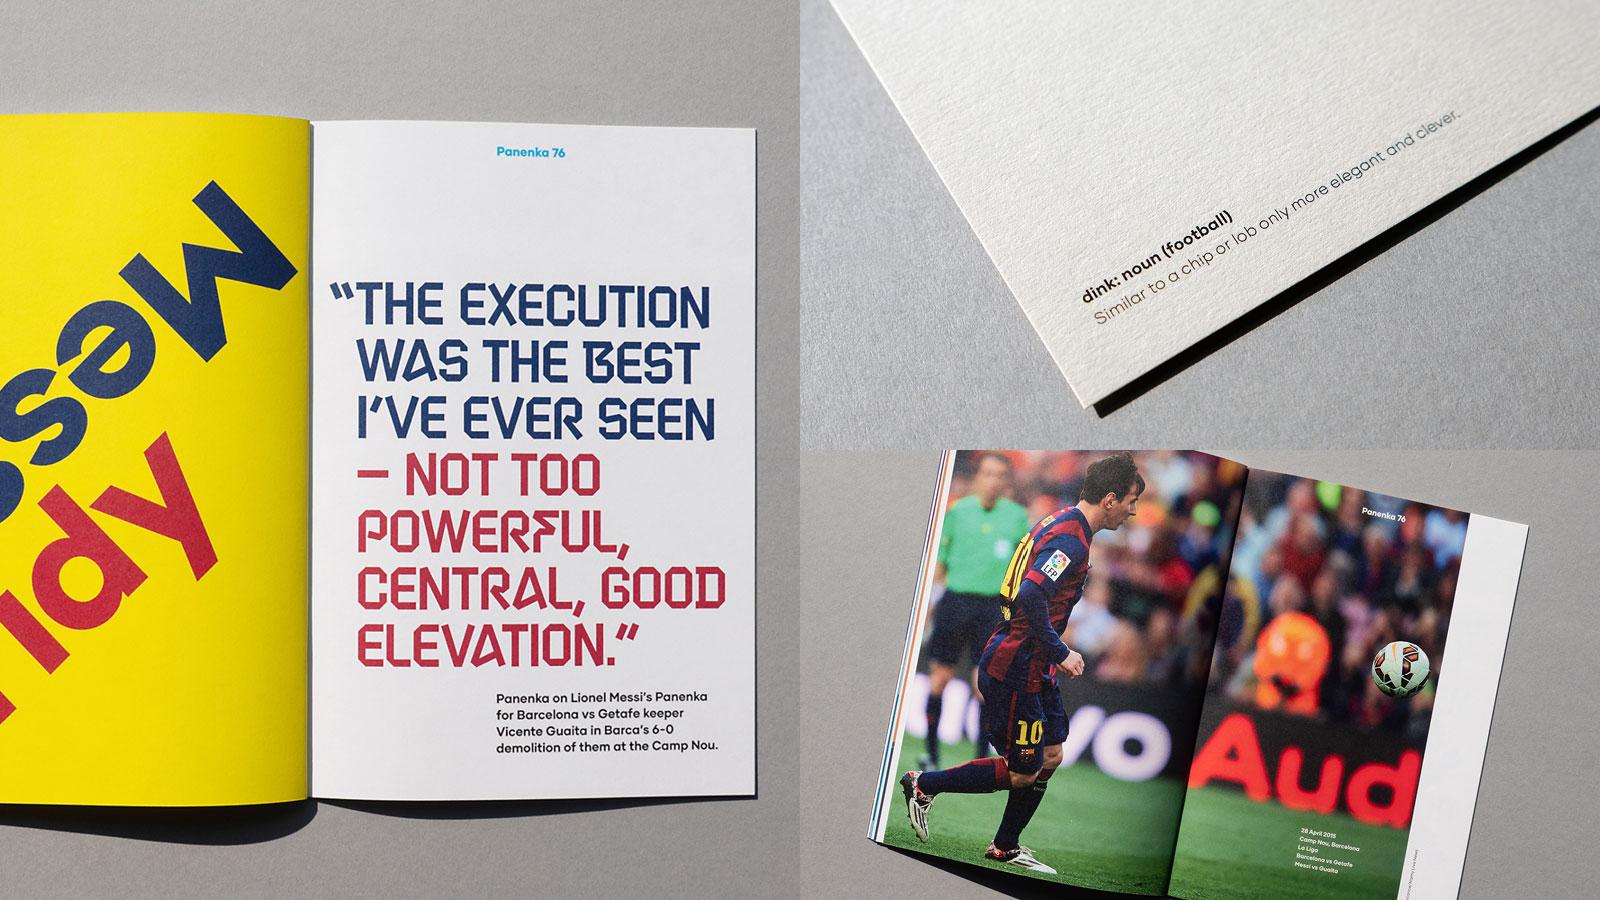 branding-identity-design-sport-football-graphics-dinkit-artwork-prints-posters-gallery-milton-keynes-london-8